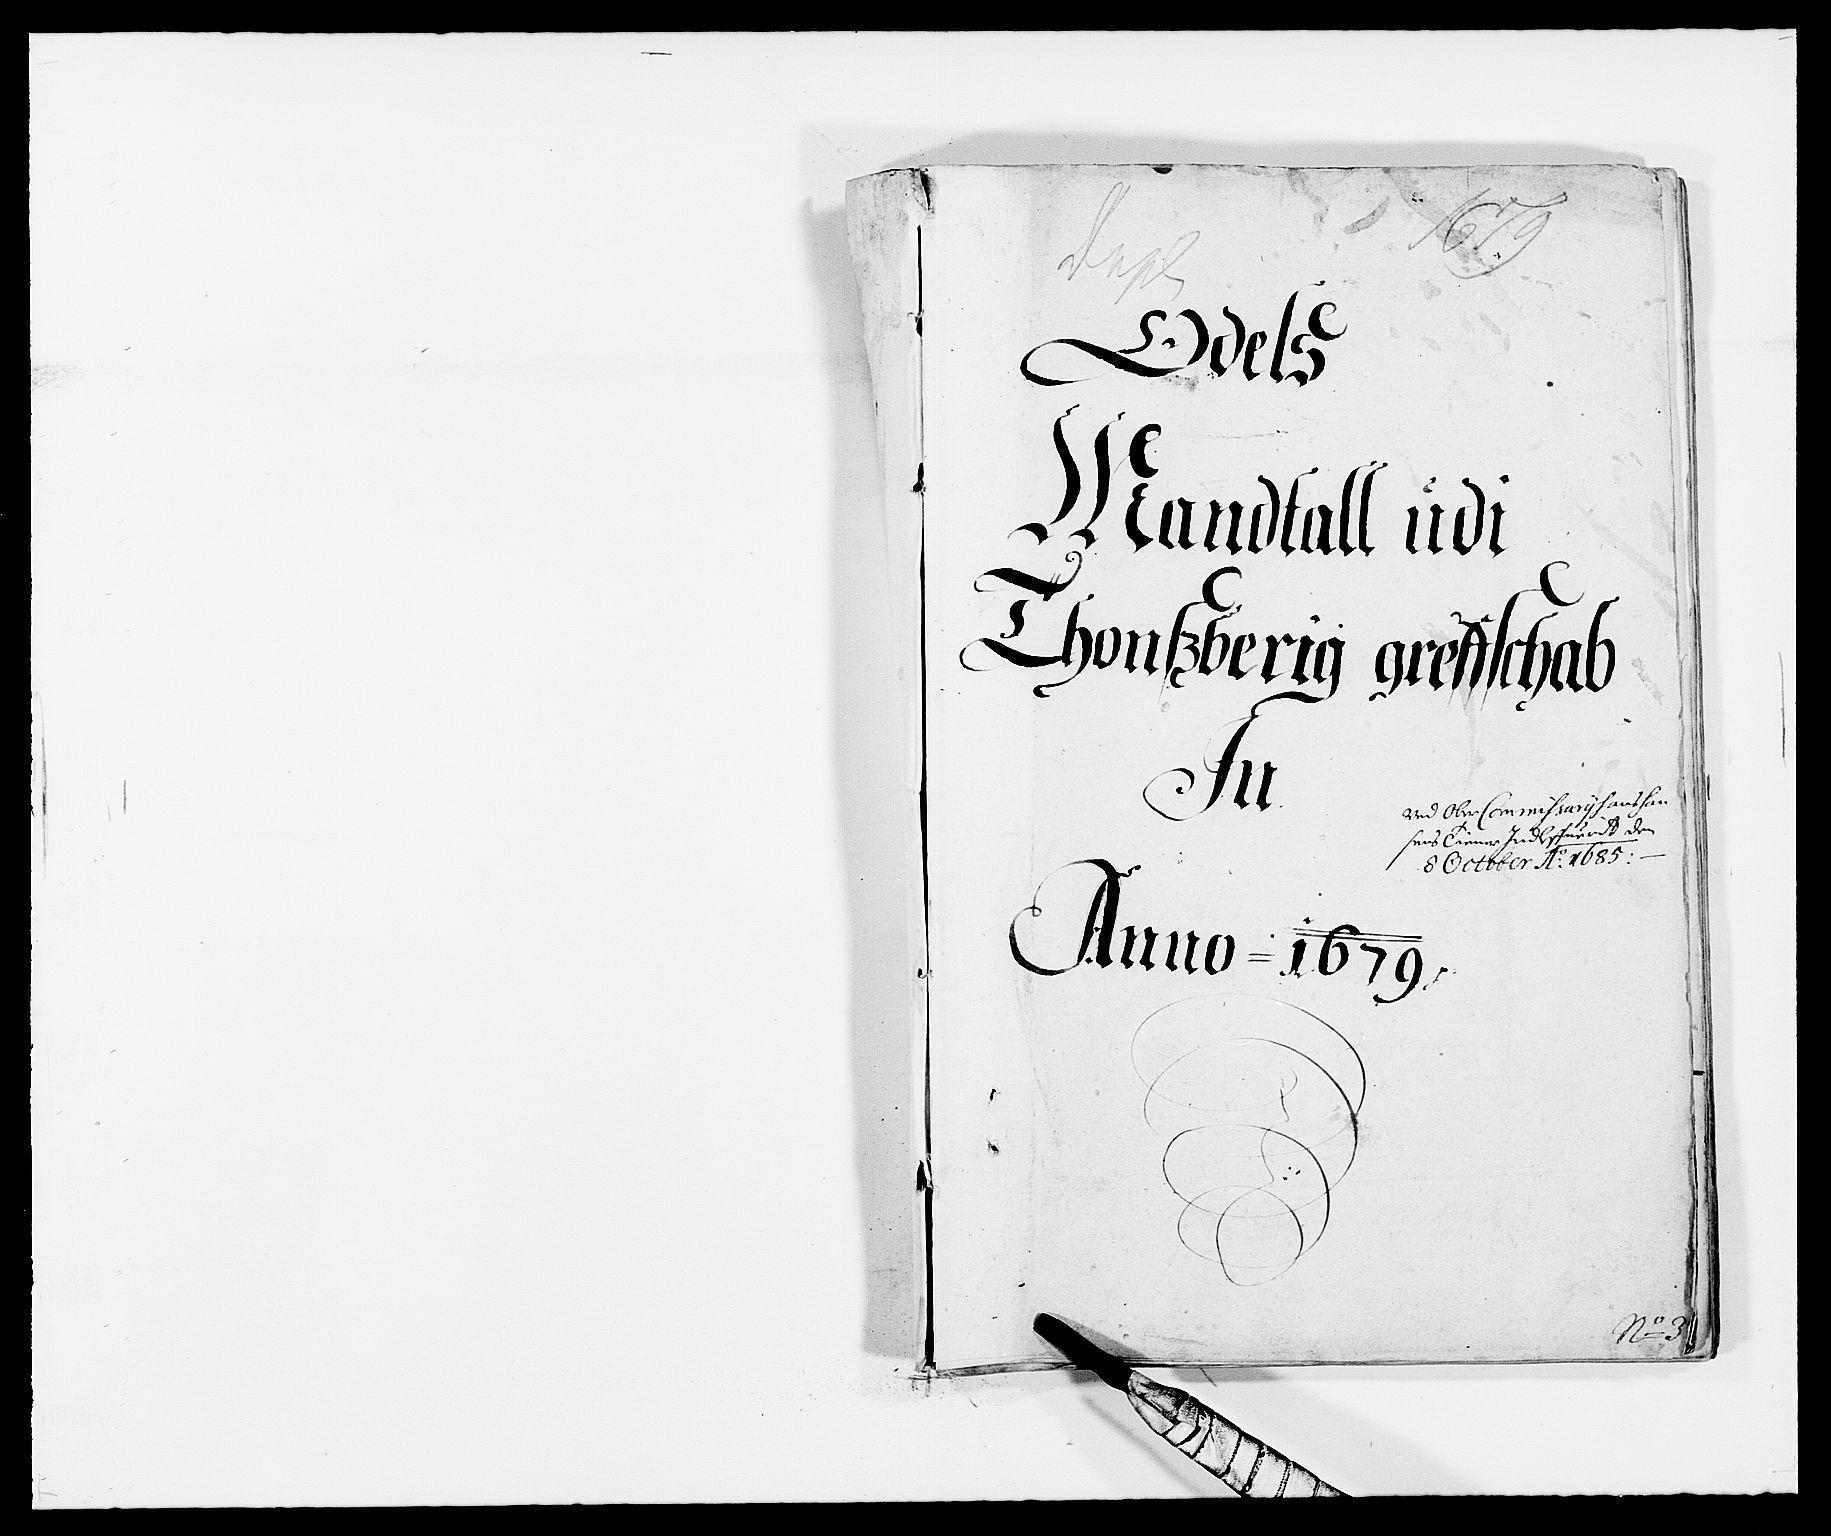 RA, Rentekammeret inntil 1814, Reviderte regnskaper, Fogderegnskap, R32/L1847: Fogderegnskap Jarlsberg grevskap, 1679-1680, s. 221